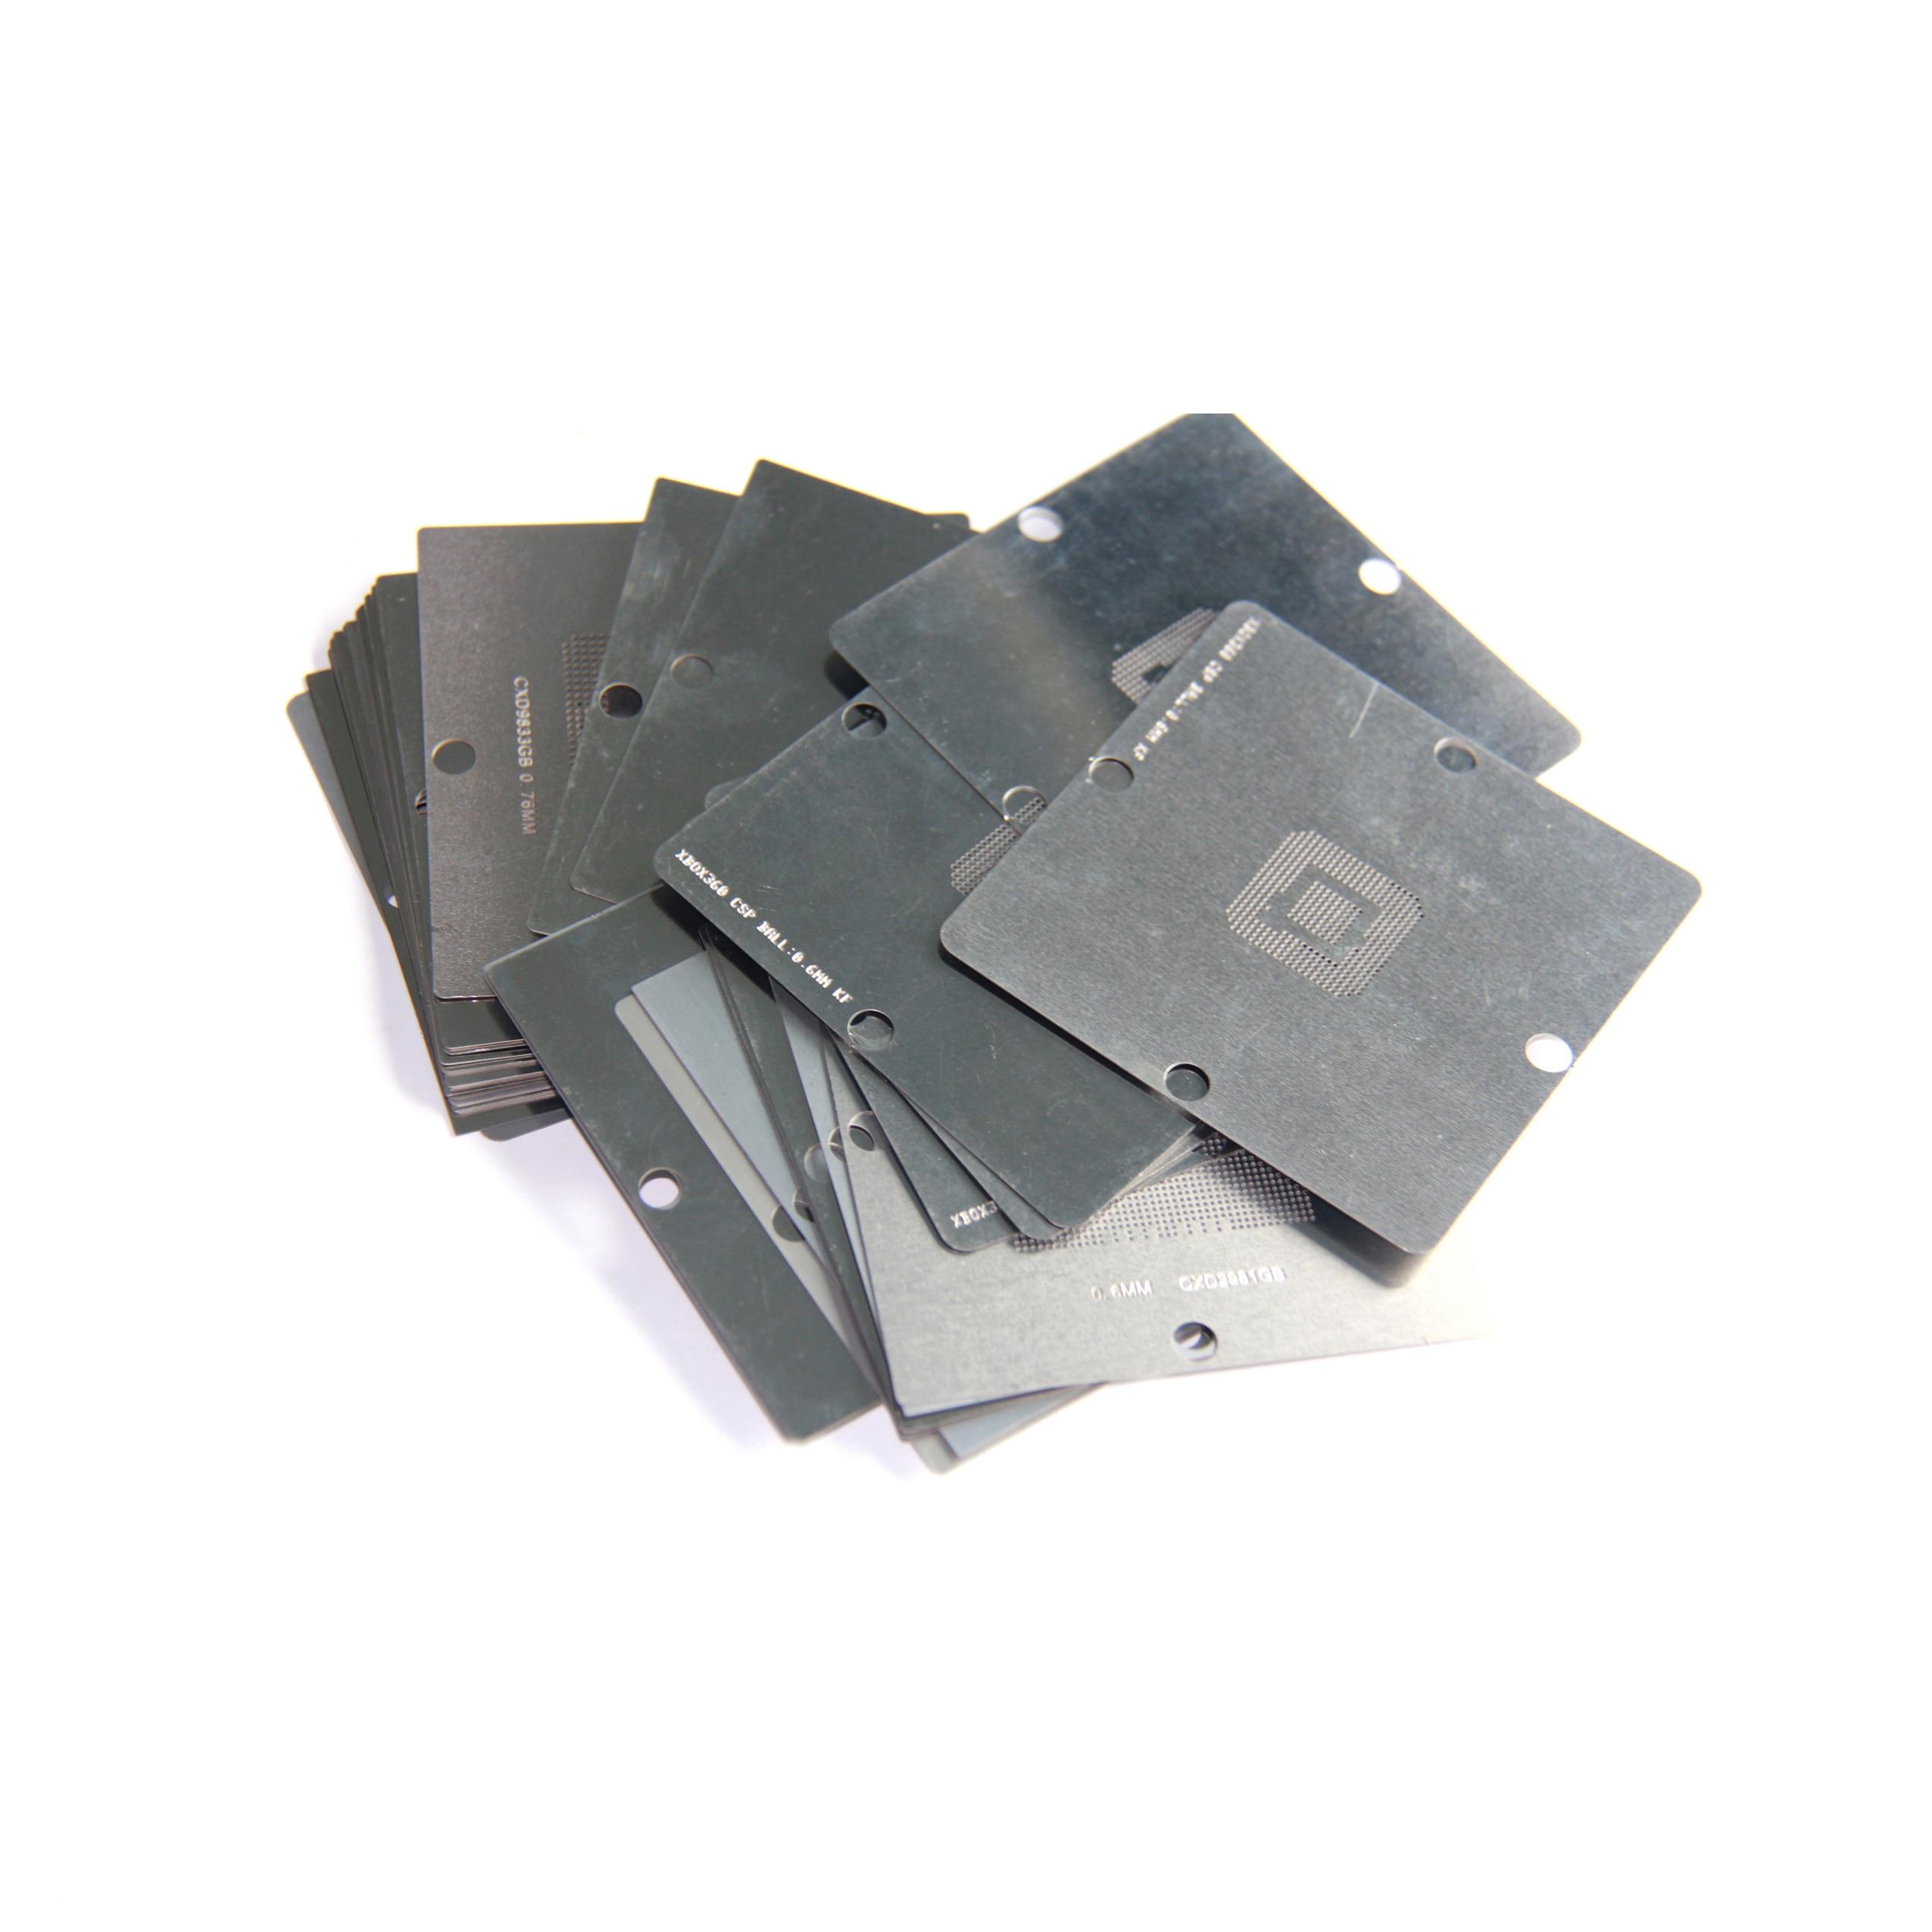 Envío Gratis 28 unids/set plantilla BGA XBOX360 ps4 ps3 se chocando neto planta Red de abalorios 80*80mm 90*90mm acero pequeño de malla